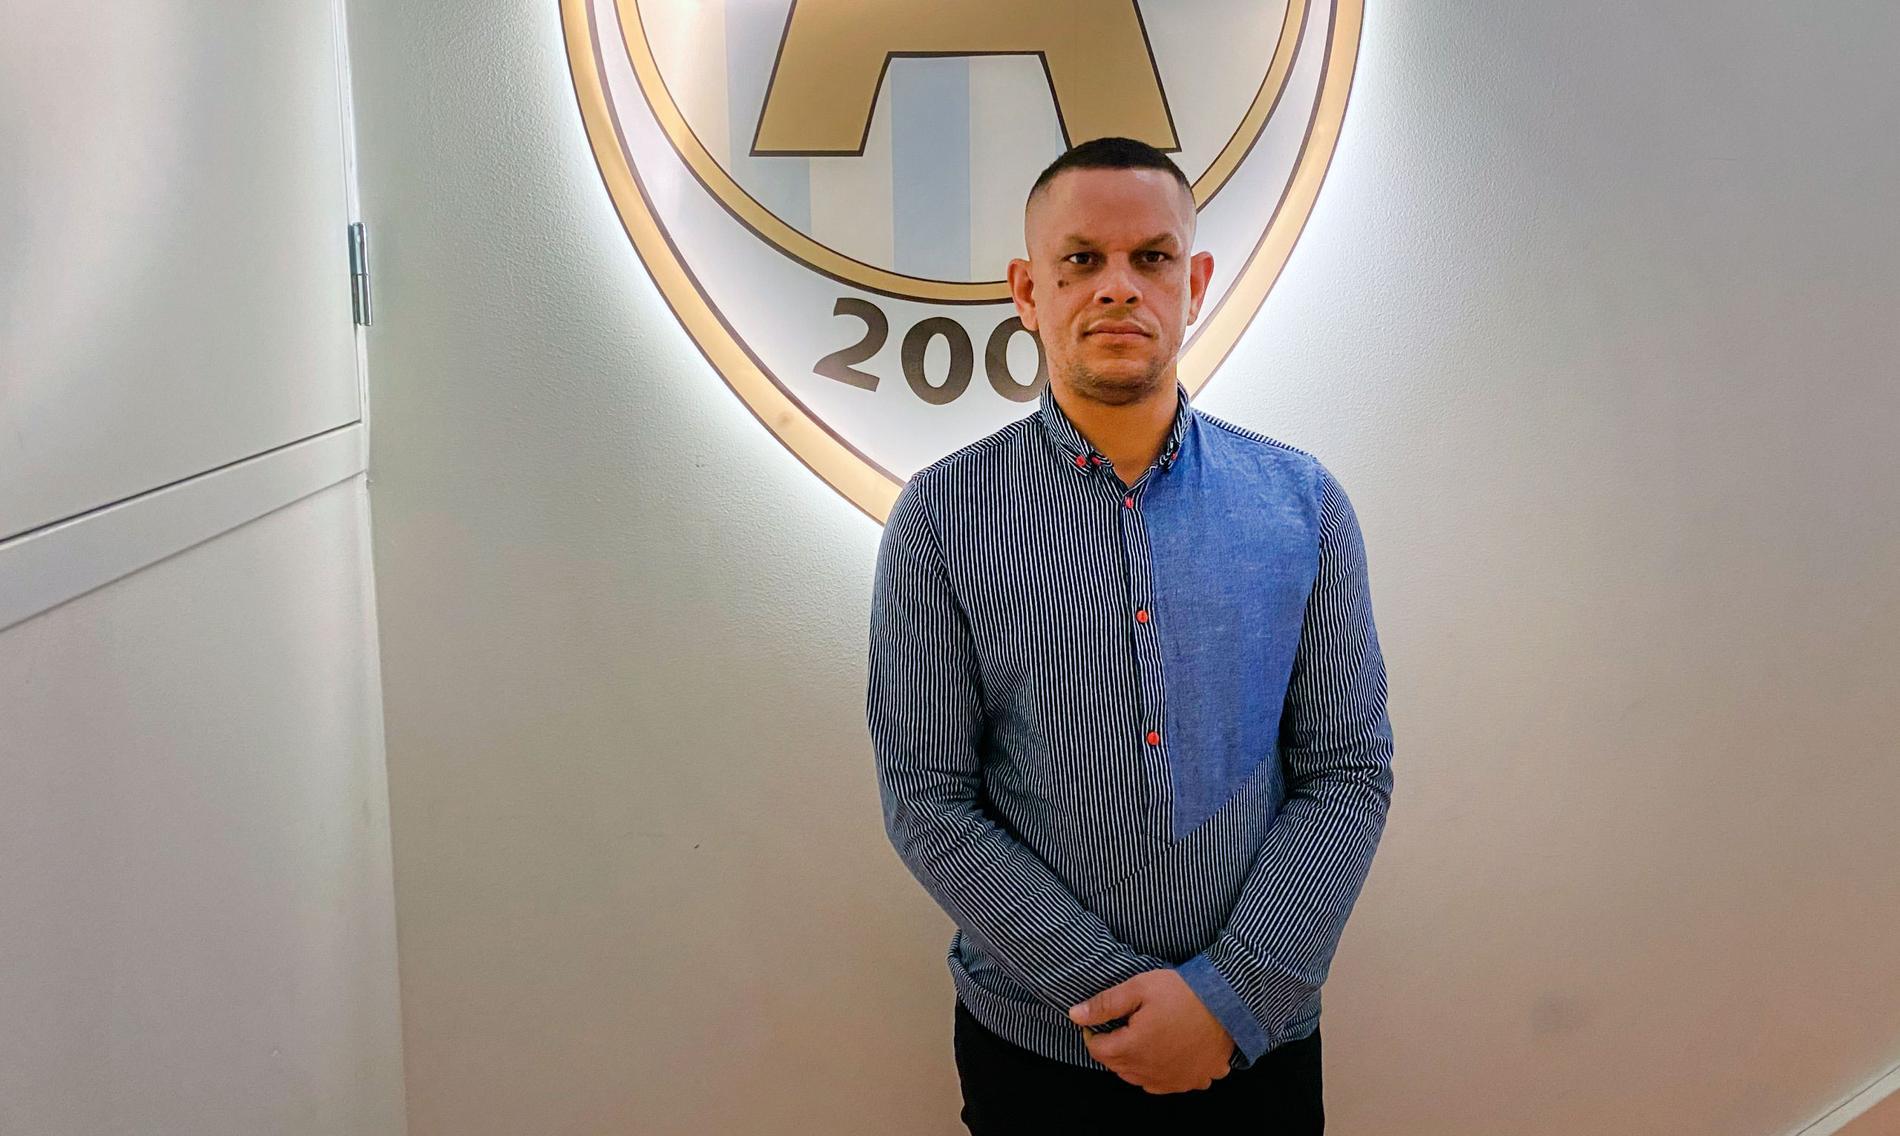 AFC Eskilstunas nye sportchef Tore Eliasson